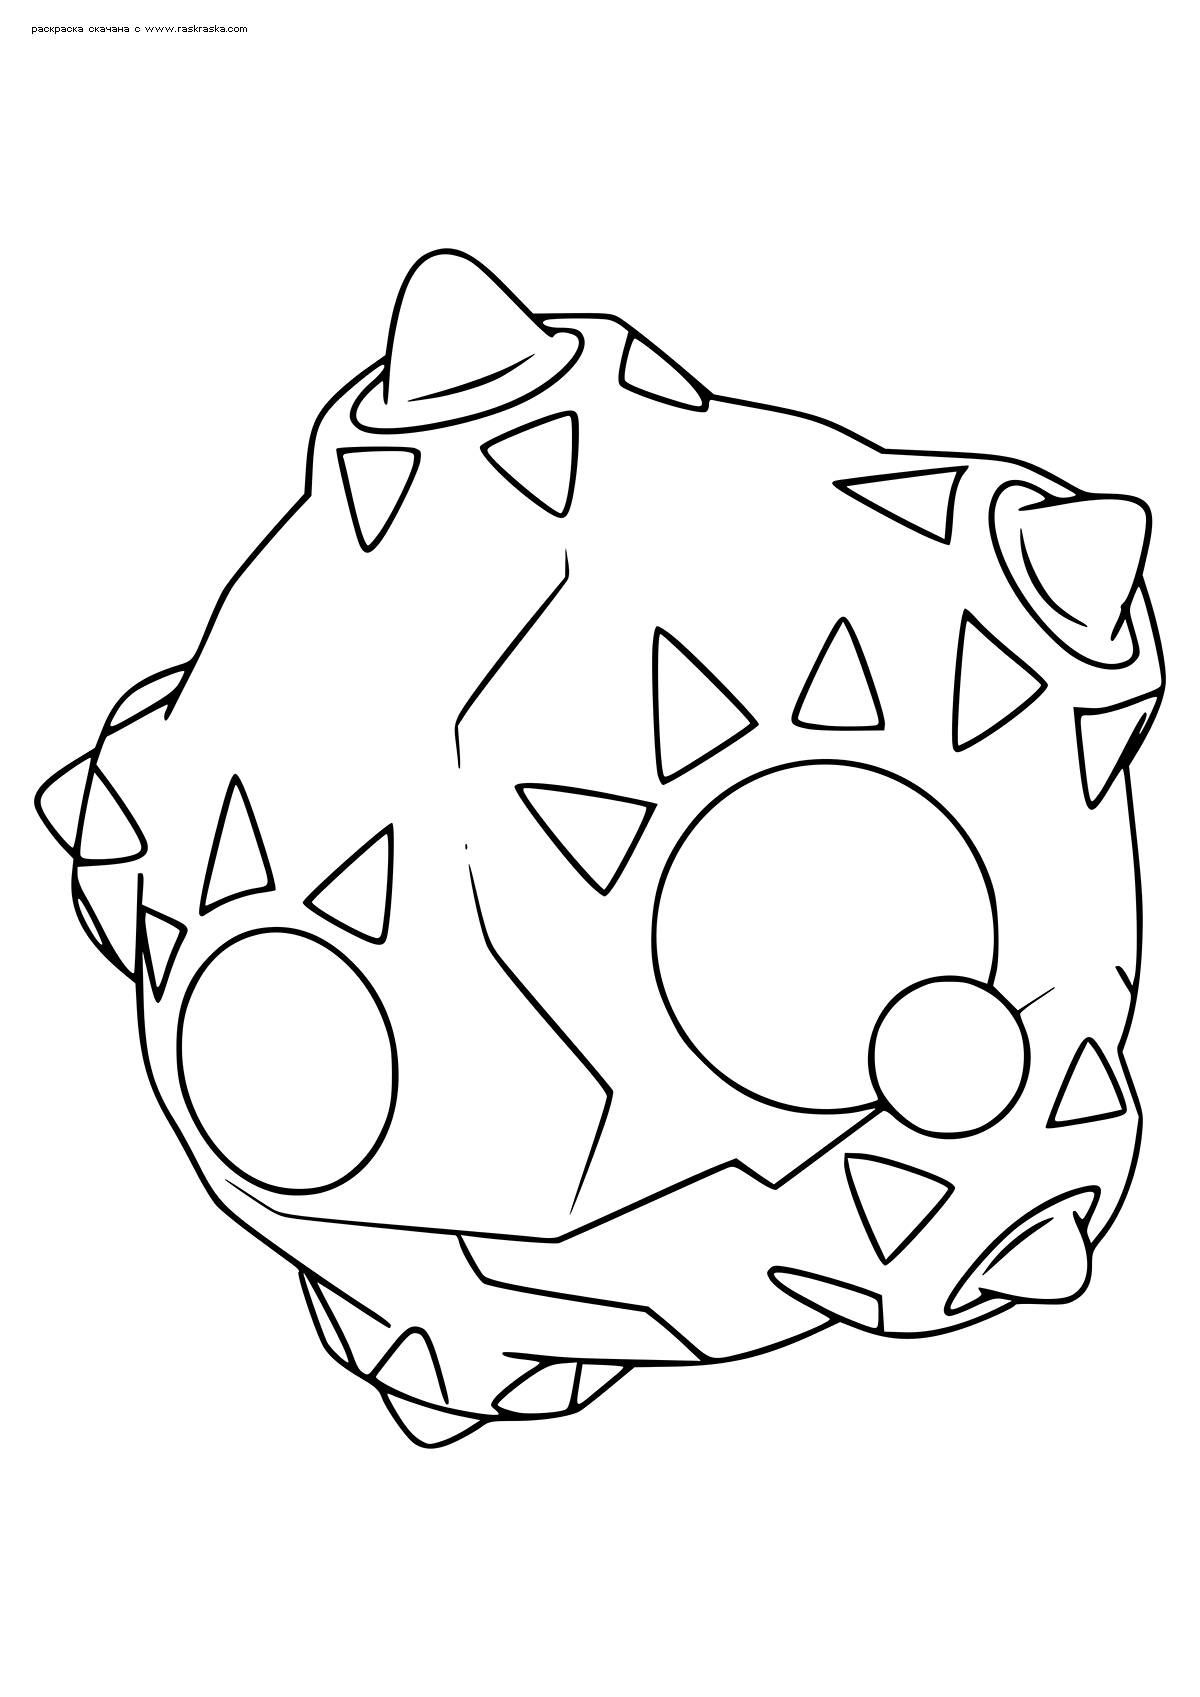 Раскраска Покемон Миниор (Minior) | Раскраски покемонов ...